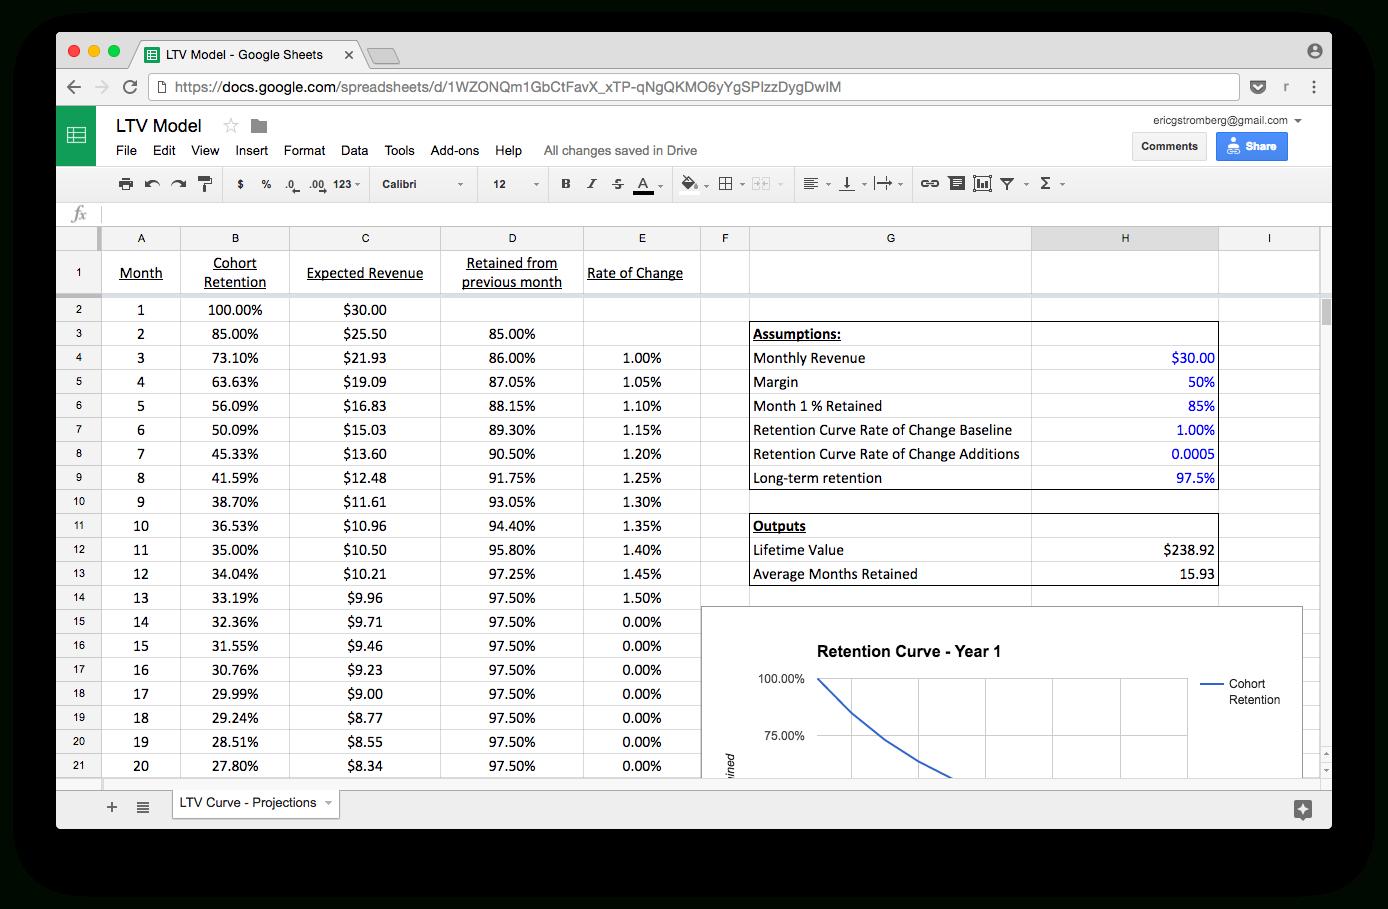 Software Roi Calculator Spreadsheet Spreadsheet Downloa Software Roi Calculator Spreadsheet